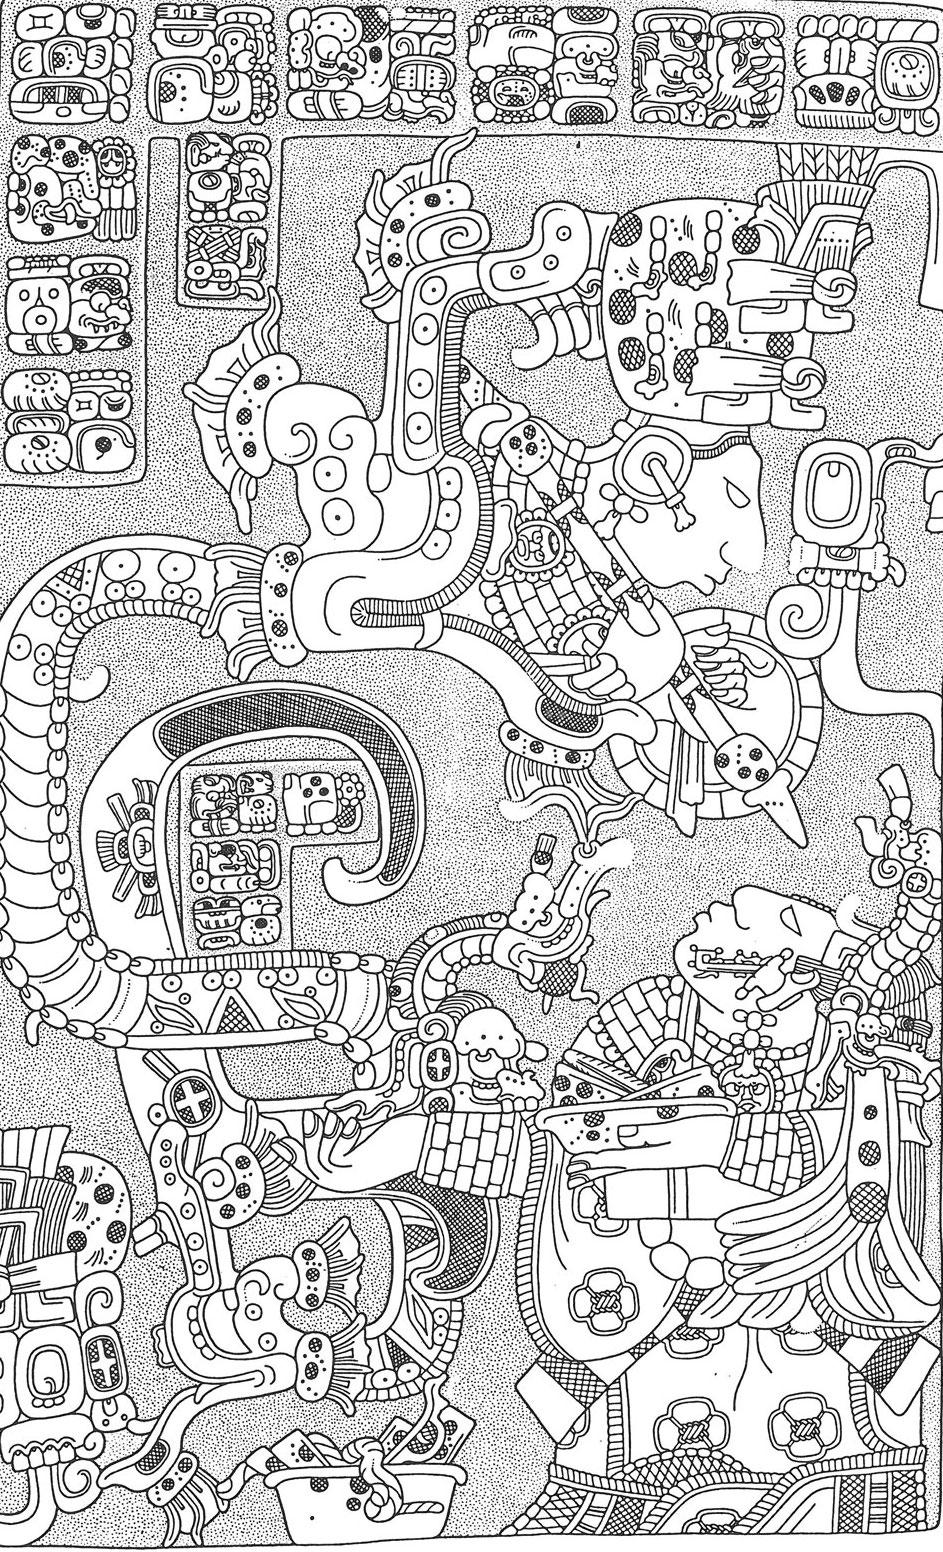 Lintel 25, drawing by Linda Schele. Yaxchilán. Source:  Pinterest